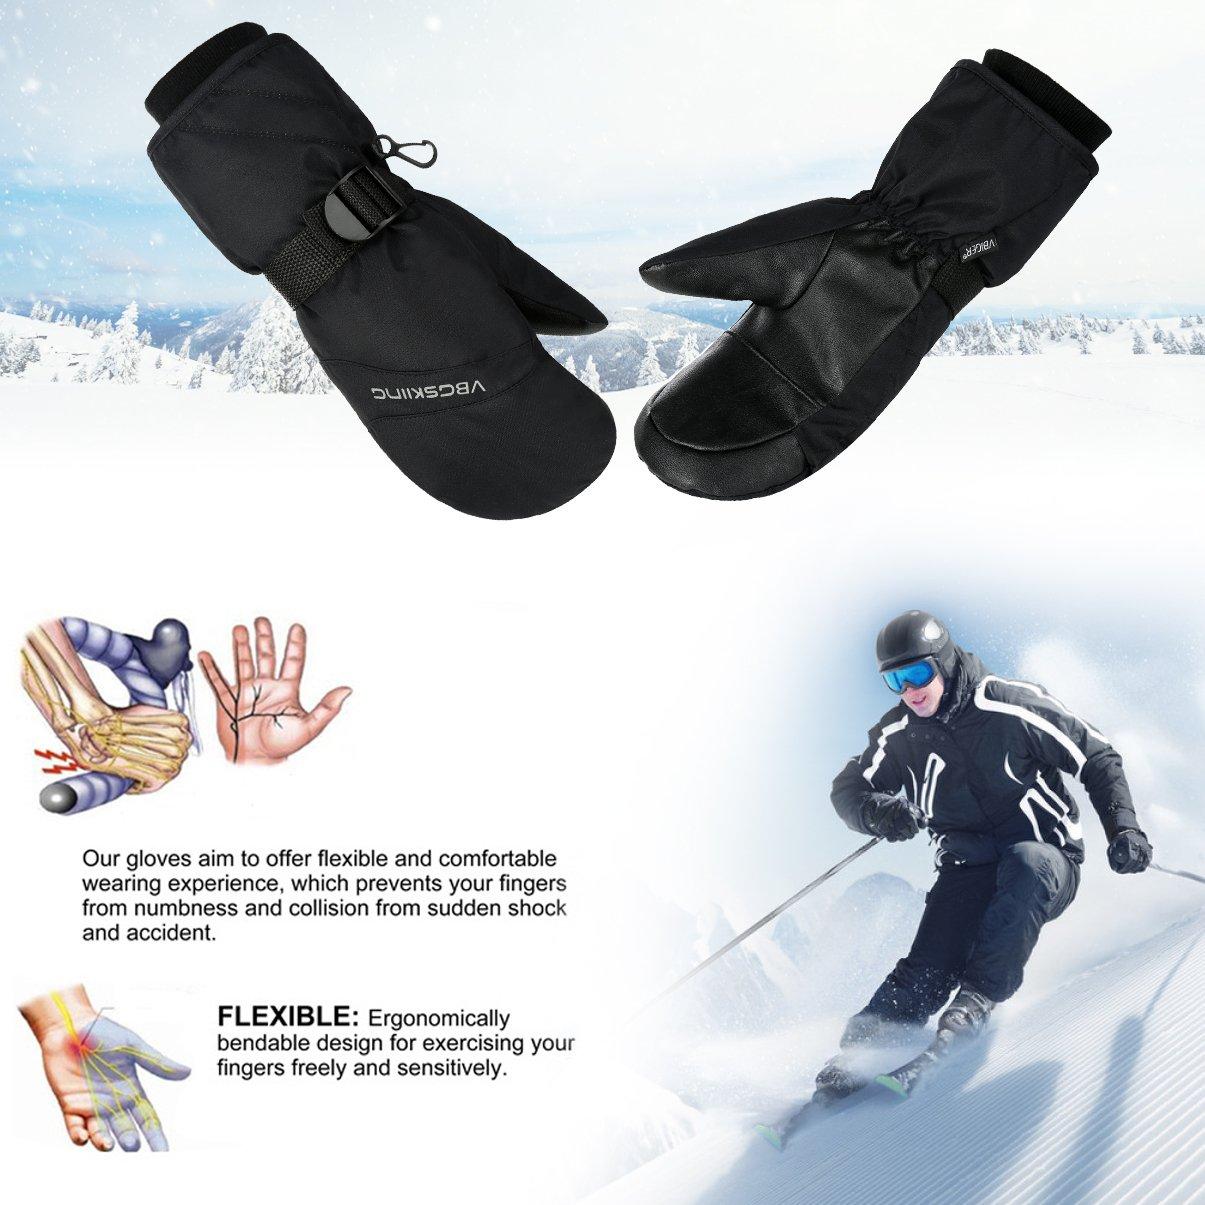 VBG VBIGER Winter Ski Mittens Waterproof Ski Gloves Warm Snow Snowboard Mittens Outdoors Cold Weather Mittens for Men Women